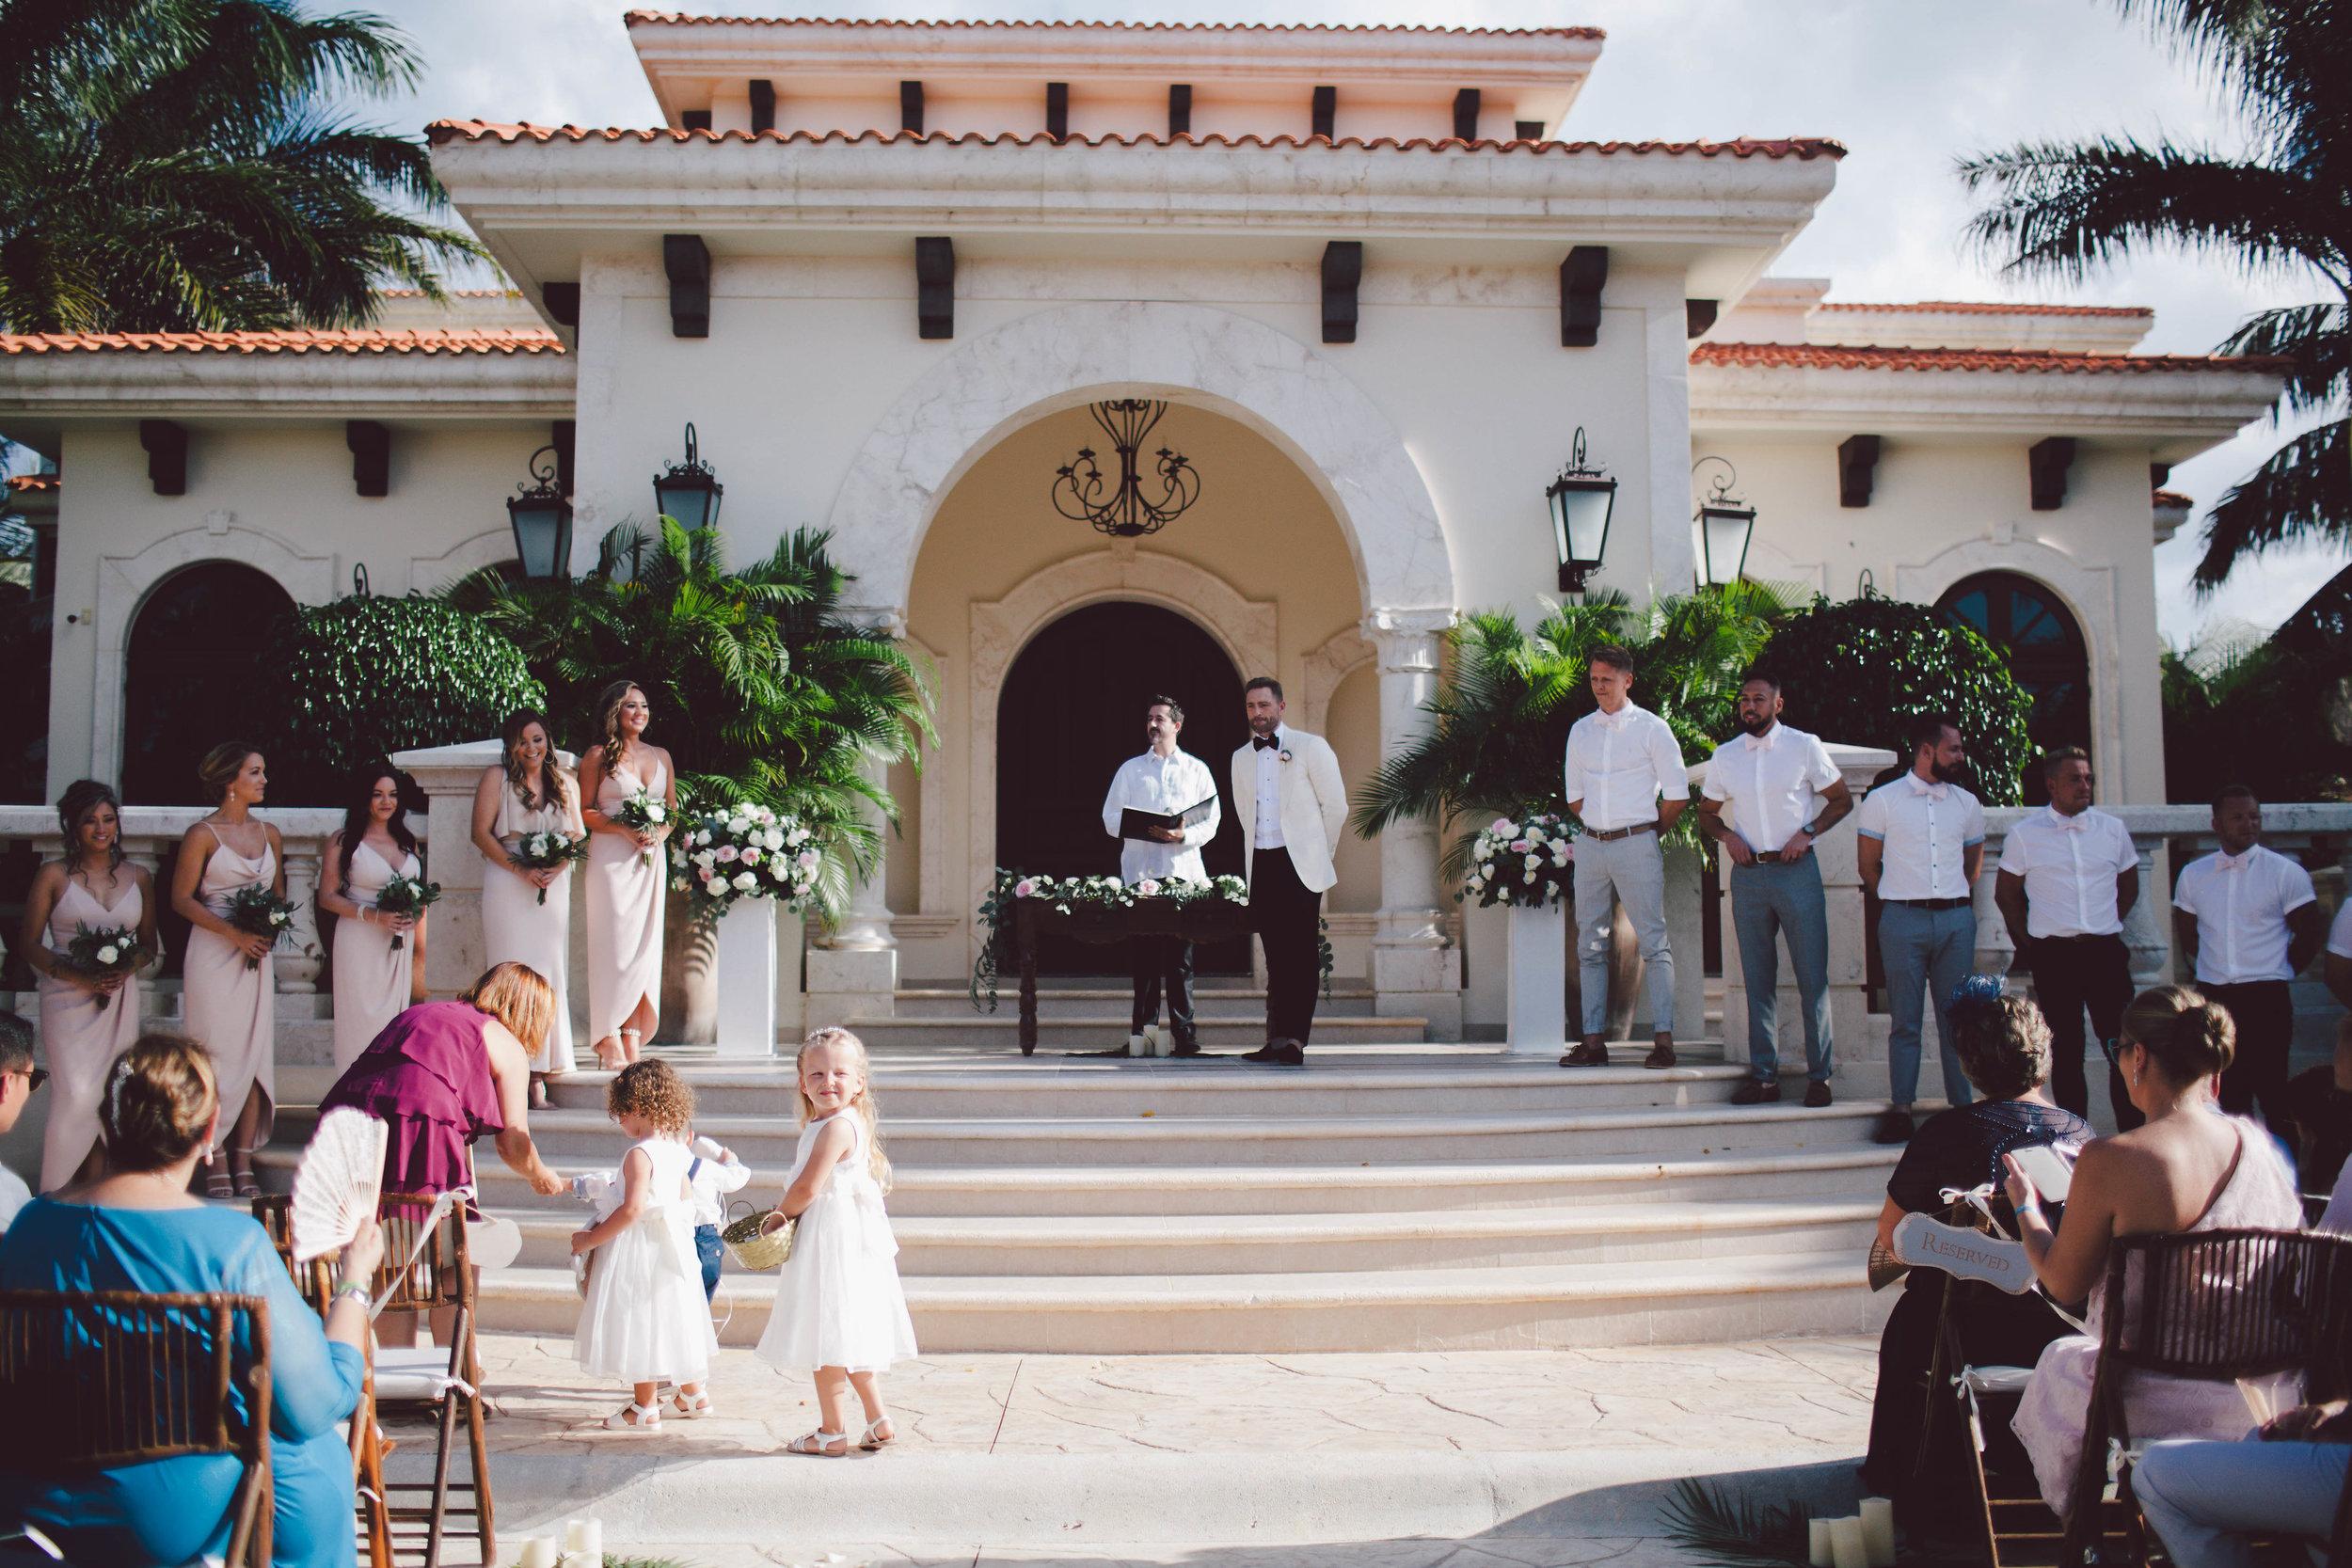 mexico_wedding_cancun_villa_la_joya_evangeline_lane_045.jpg